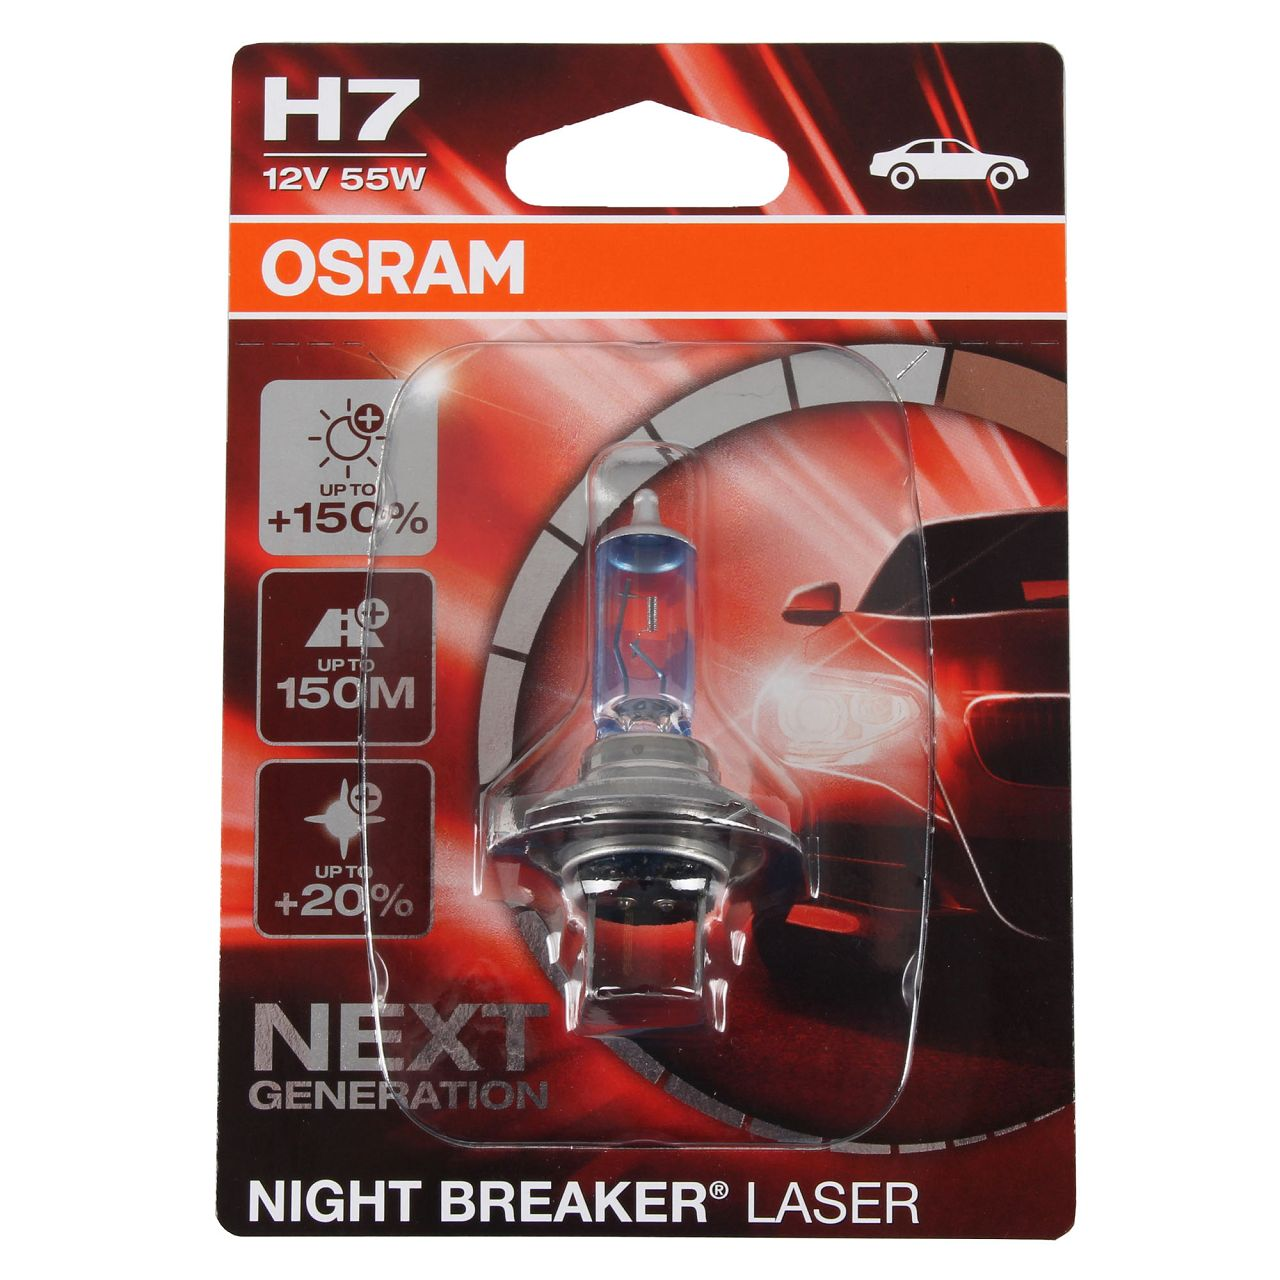 OSRAM Glühlampe H7 NIGHT BREAKER LASER 12V 55W PX26d next Generation +150%